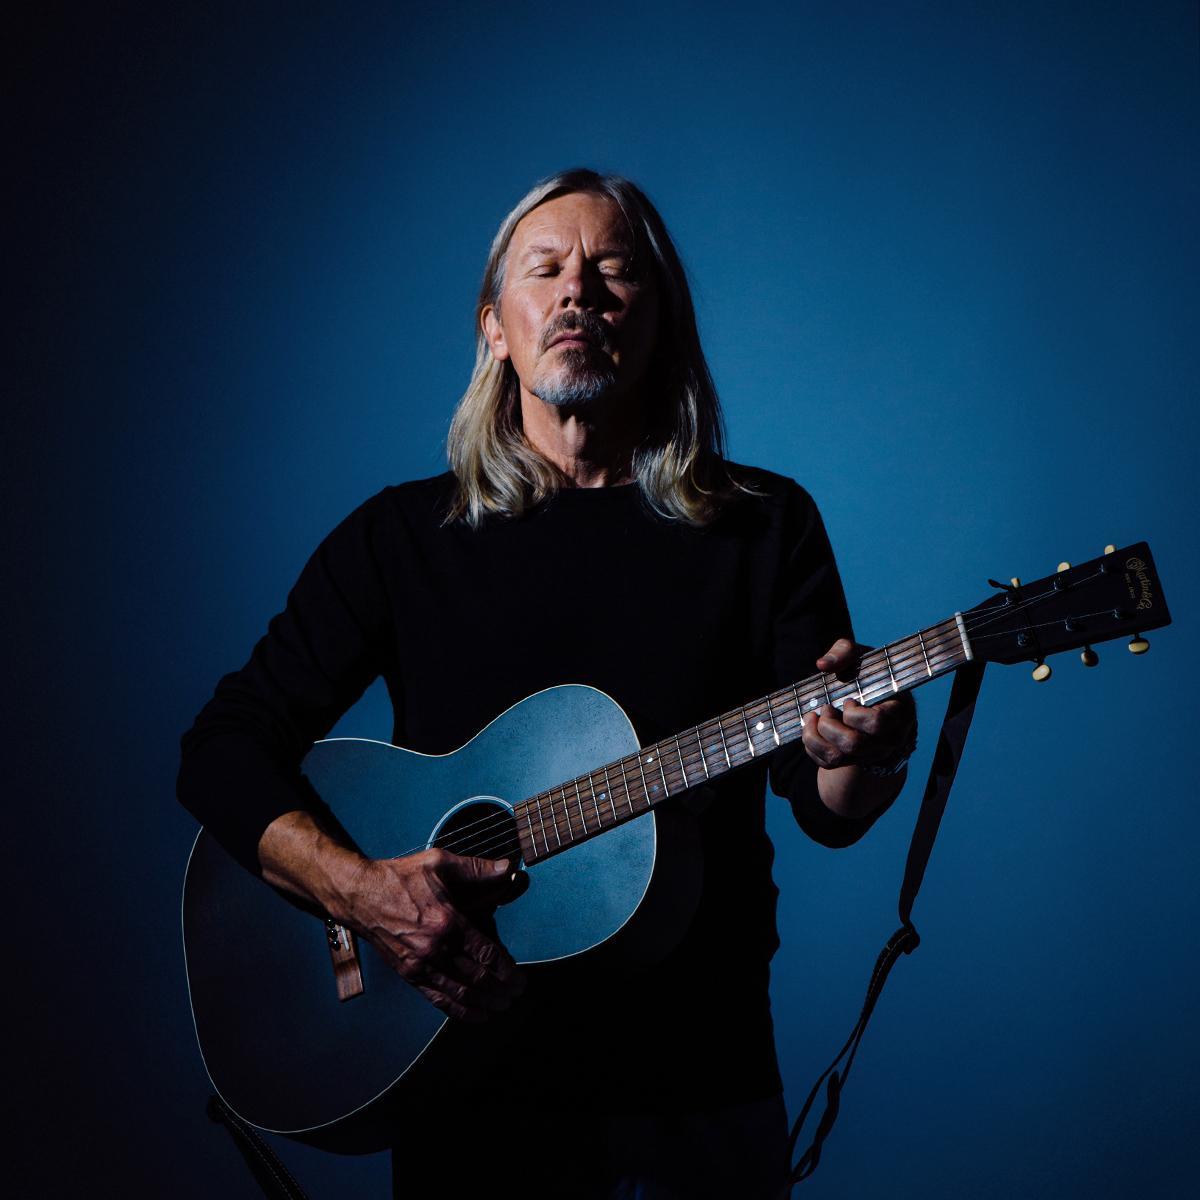 En man med gitarr.